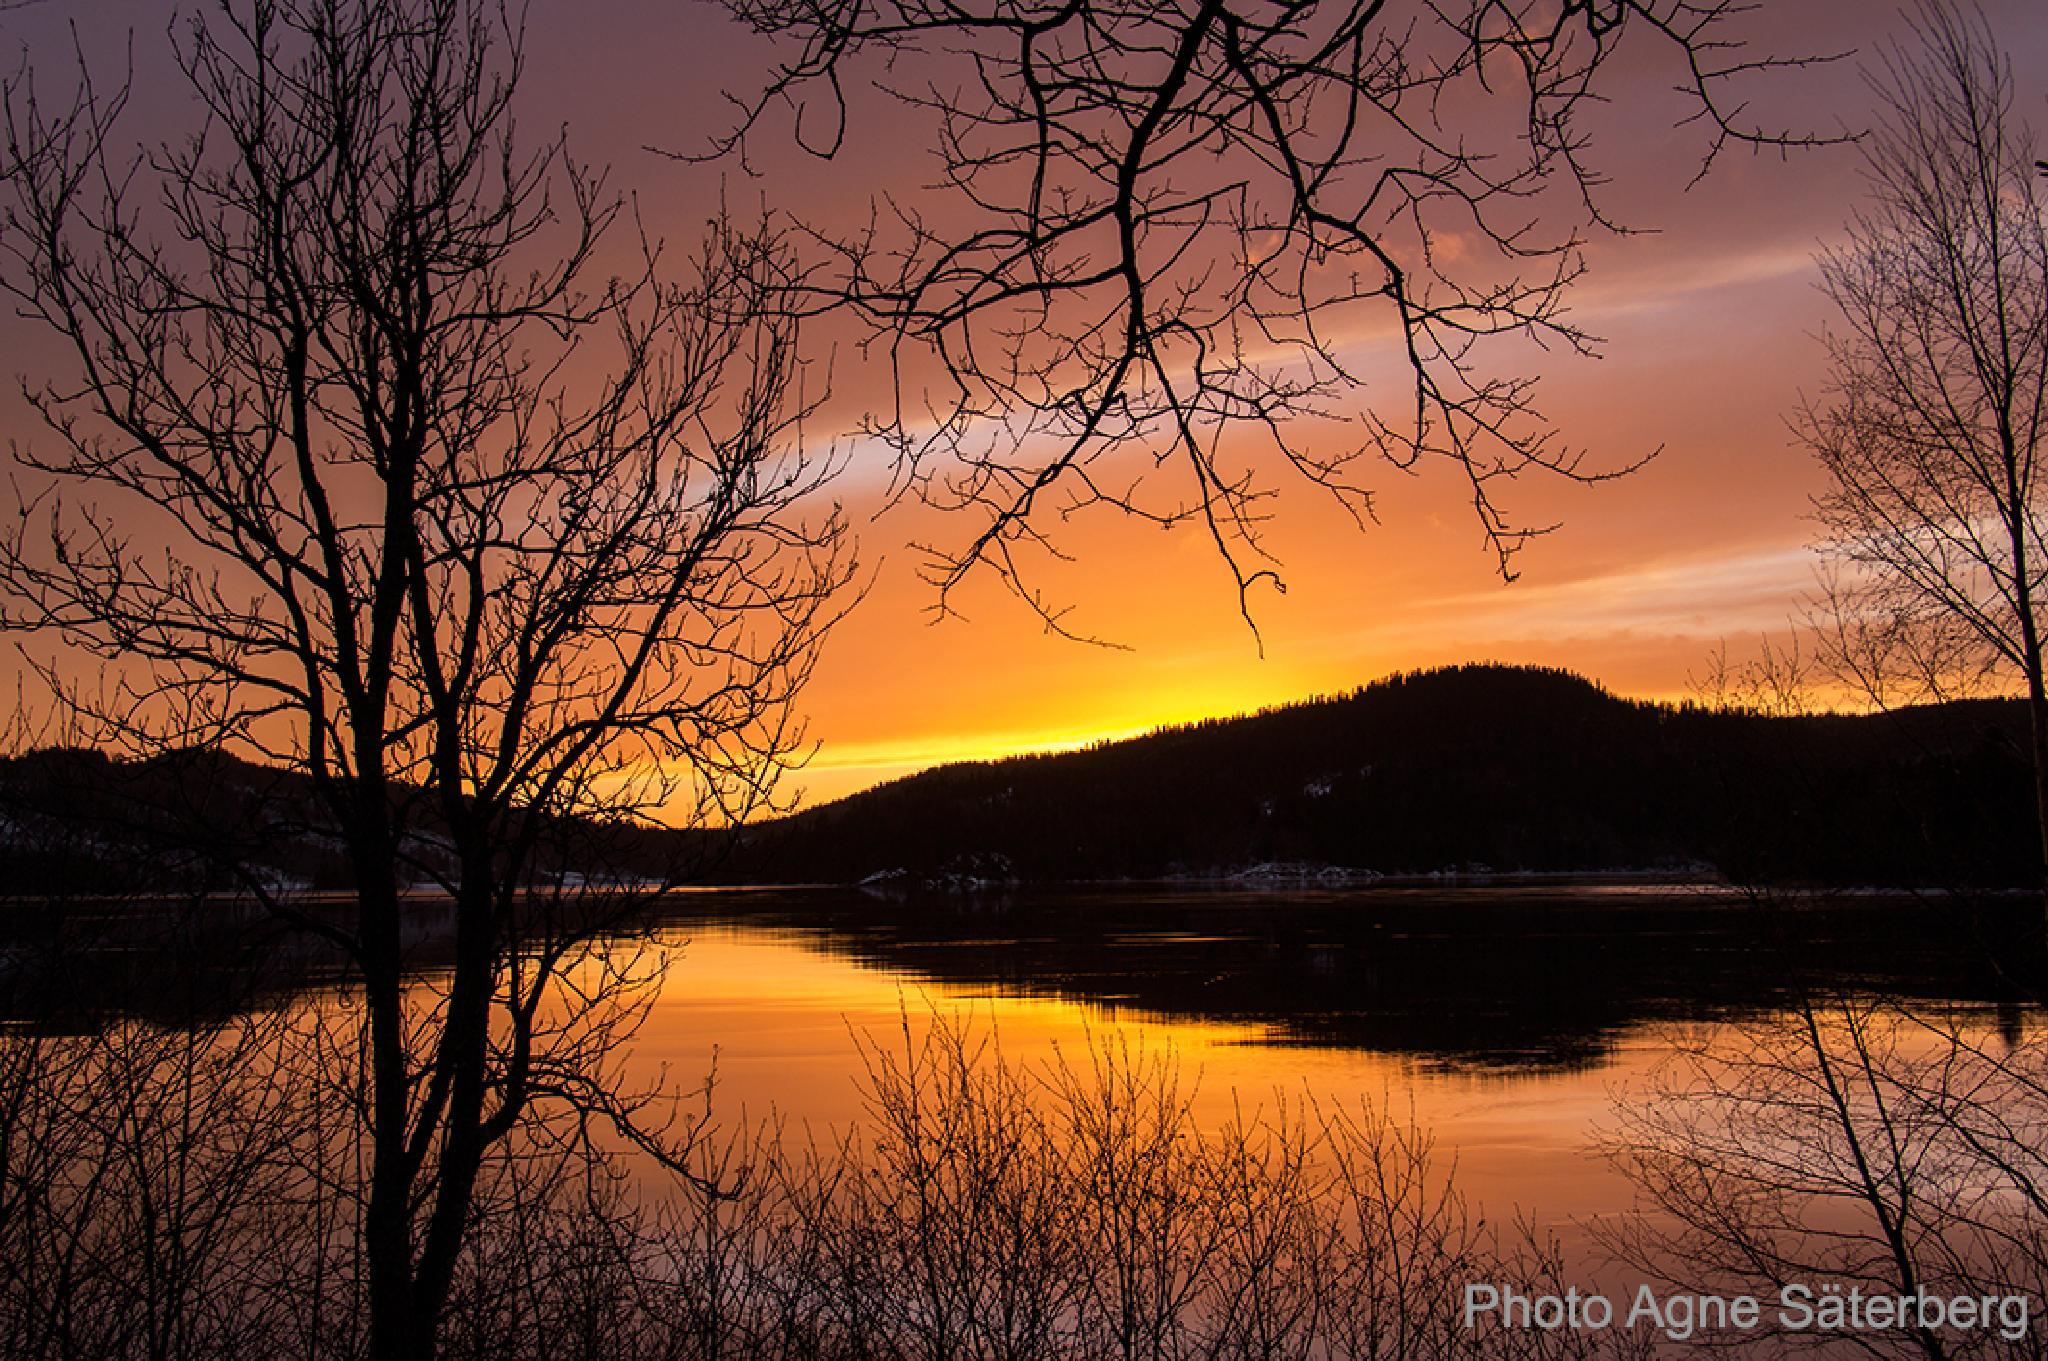 Sunset at Lappudden in Nordingrå, Sweden by Agne Säterberg